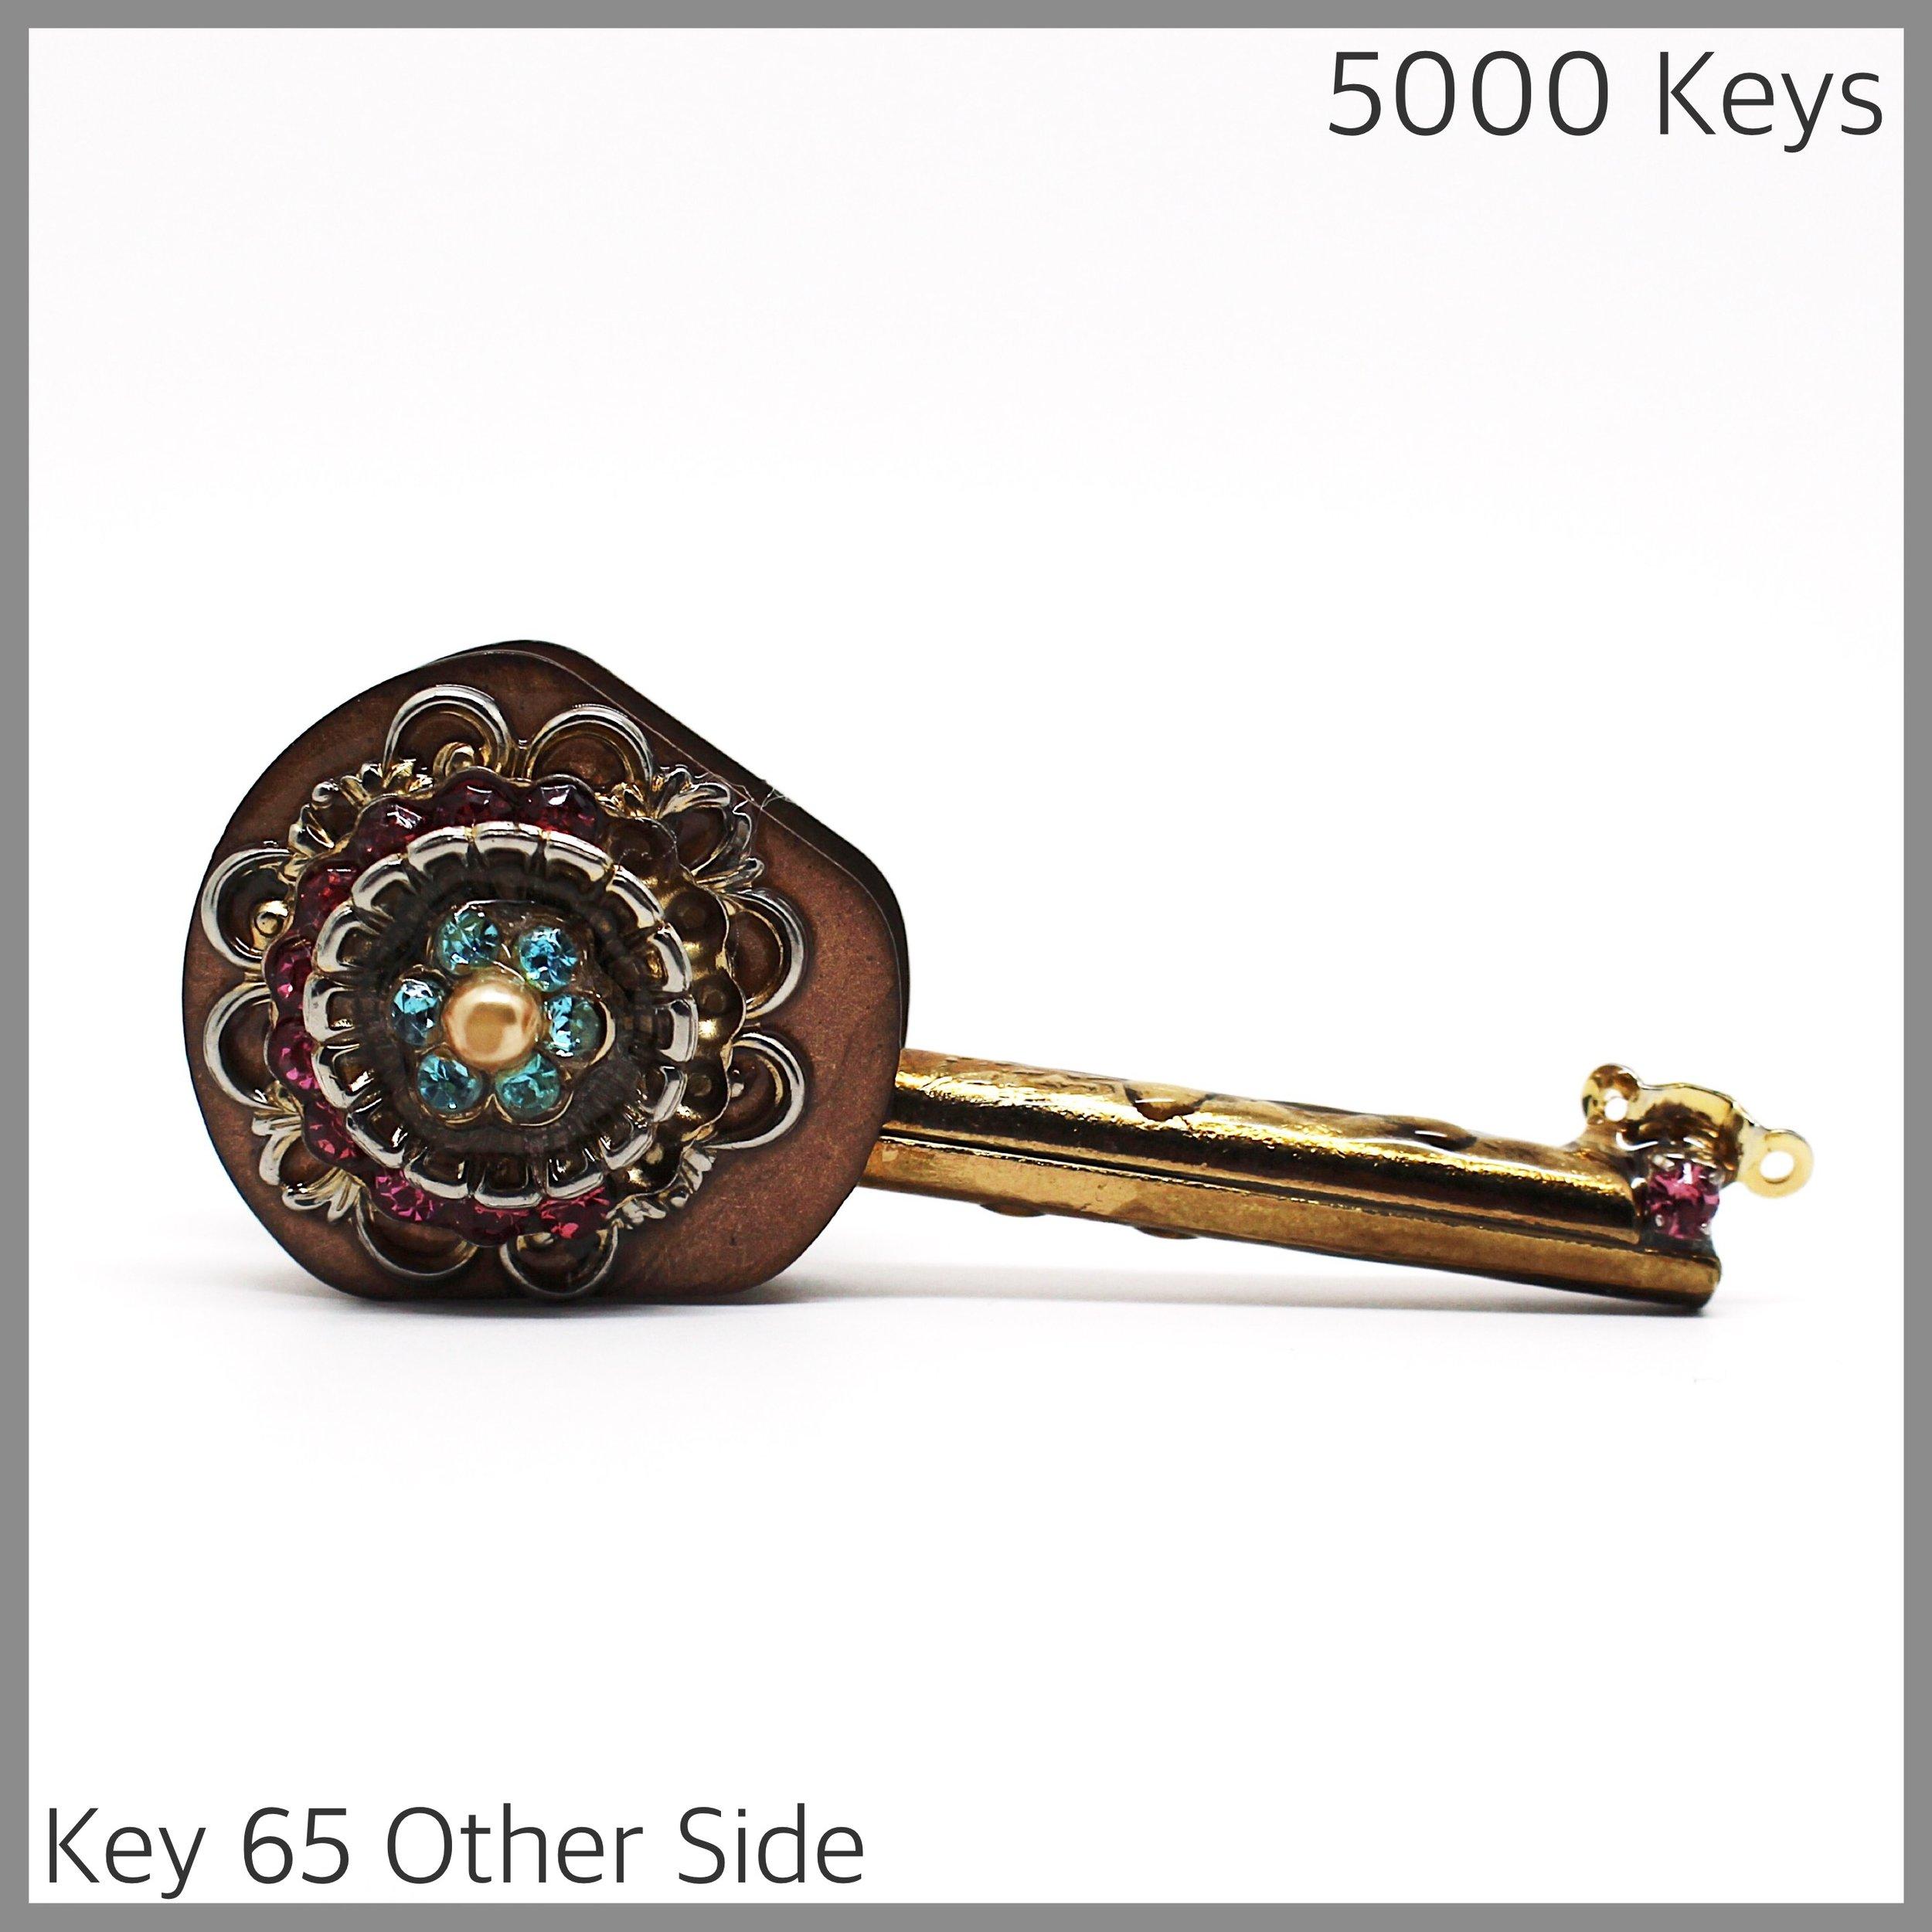 Key 65 other side - 1.JPG